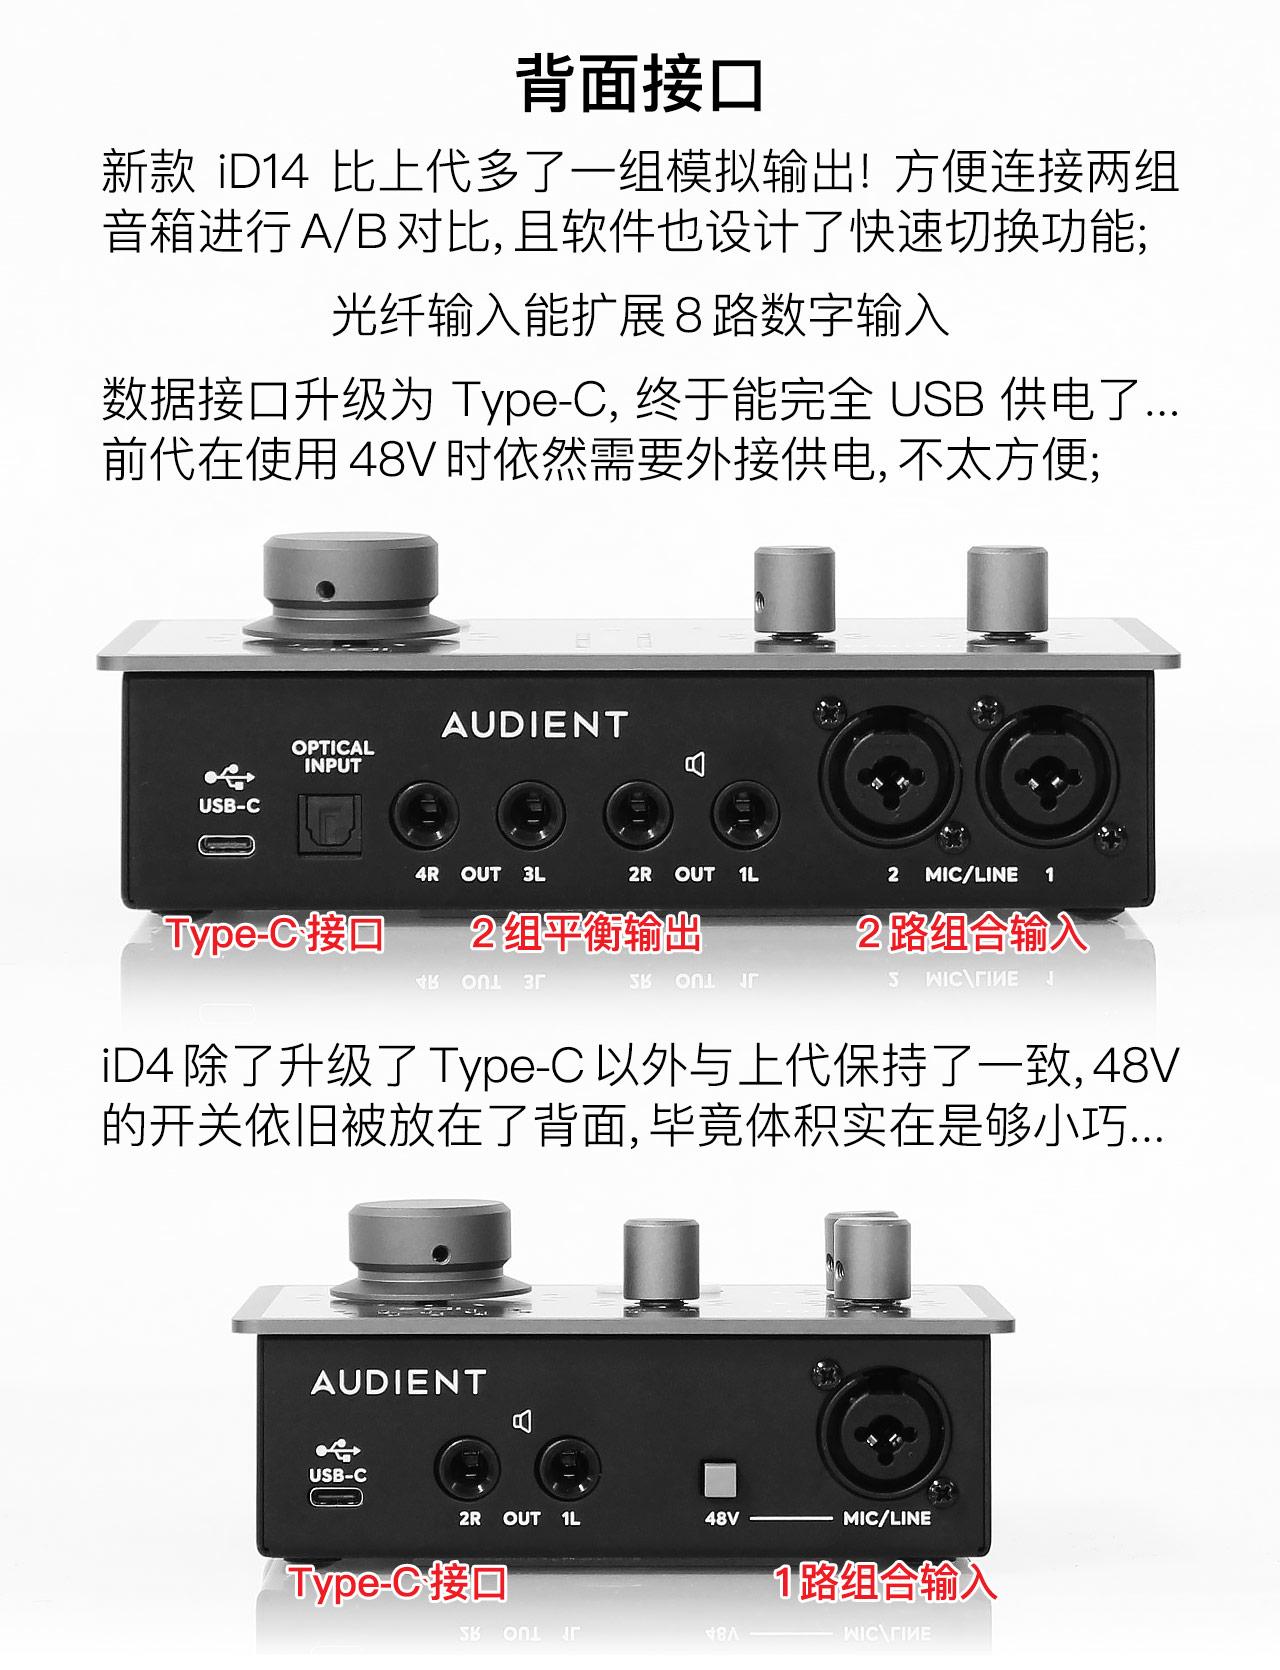 Audient_iD4&14_评测12.jpg